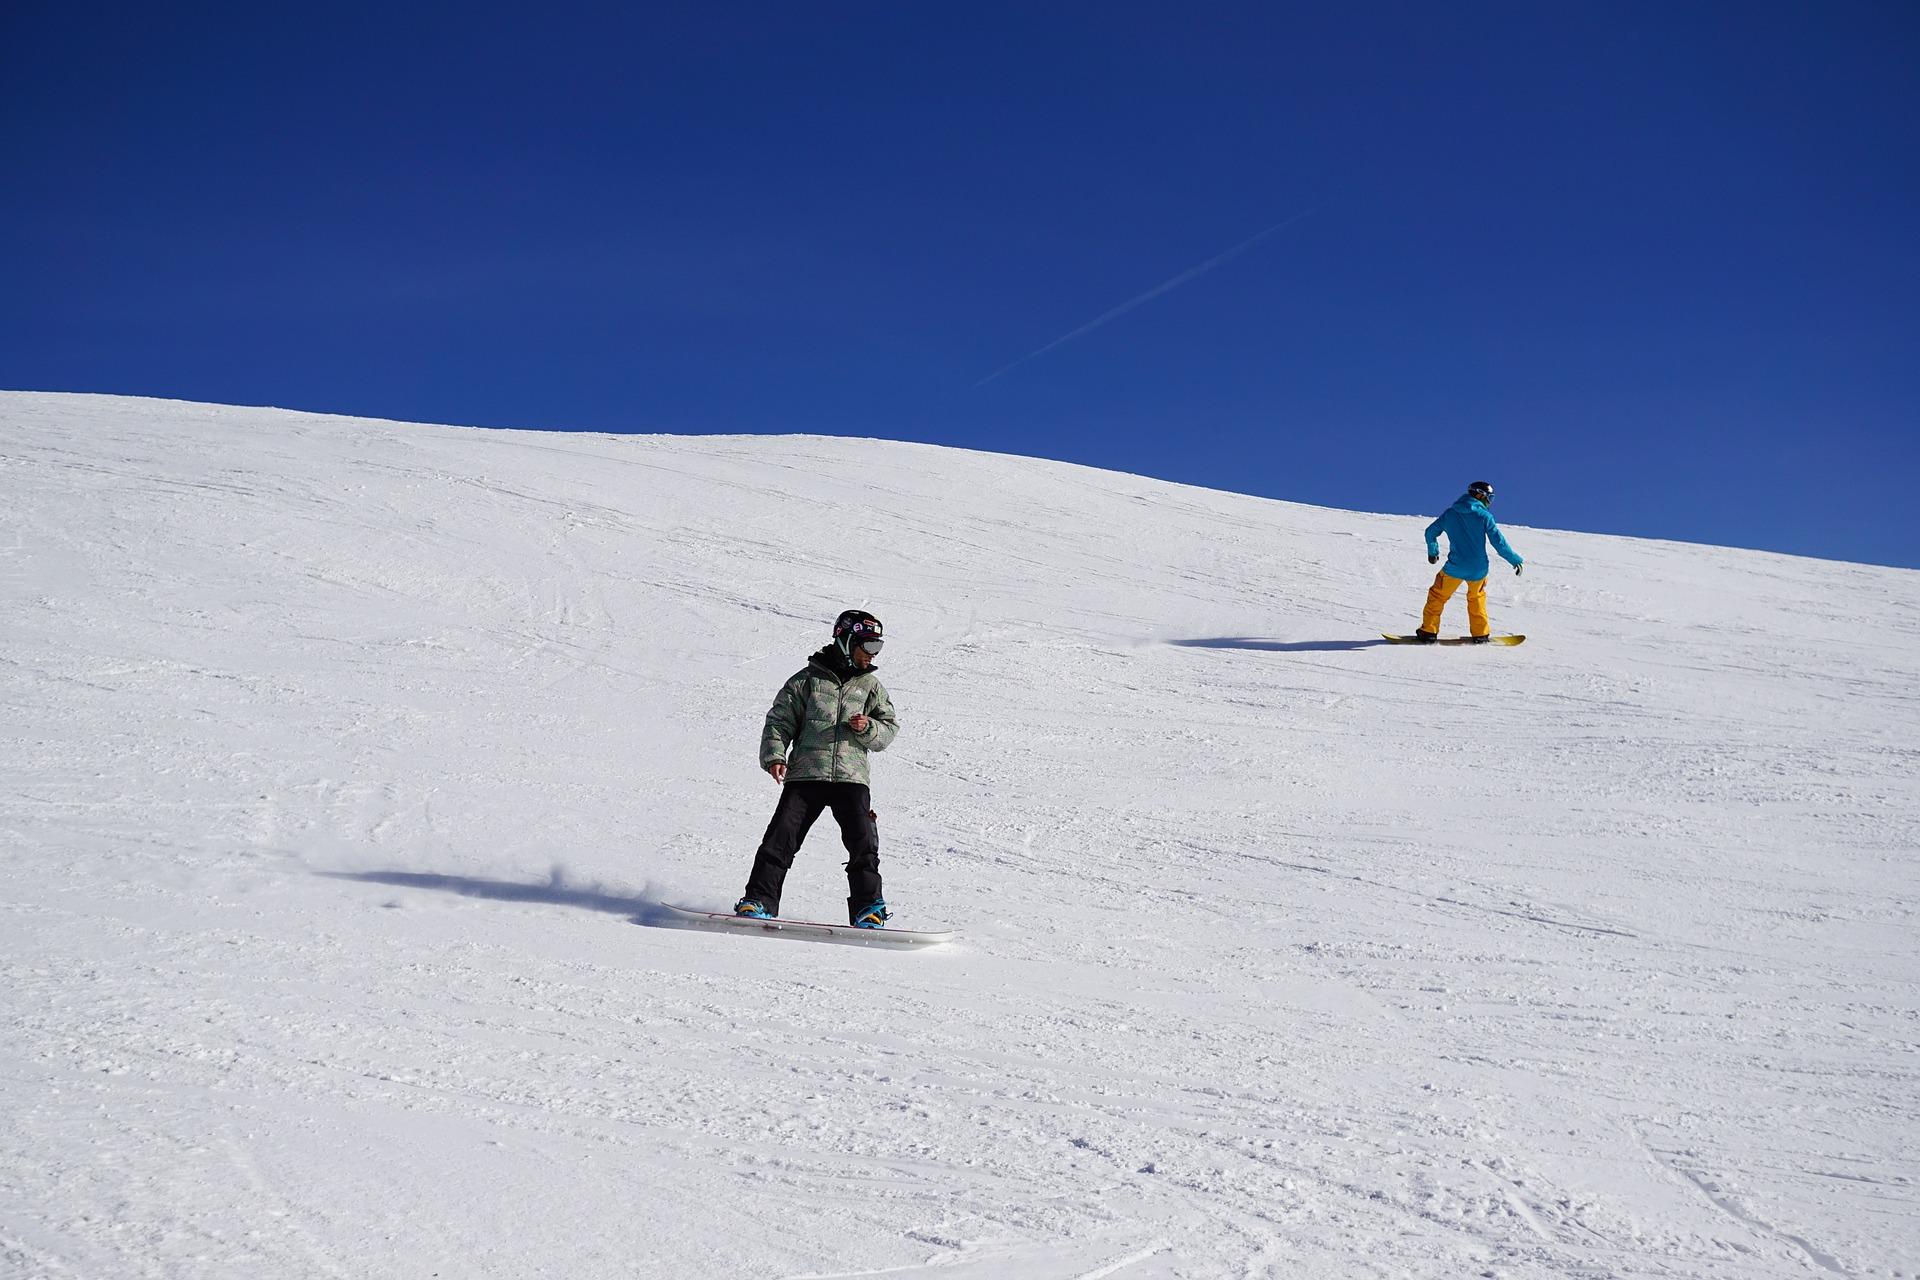 snowboard-618536_1920